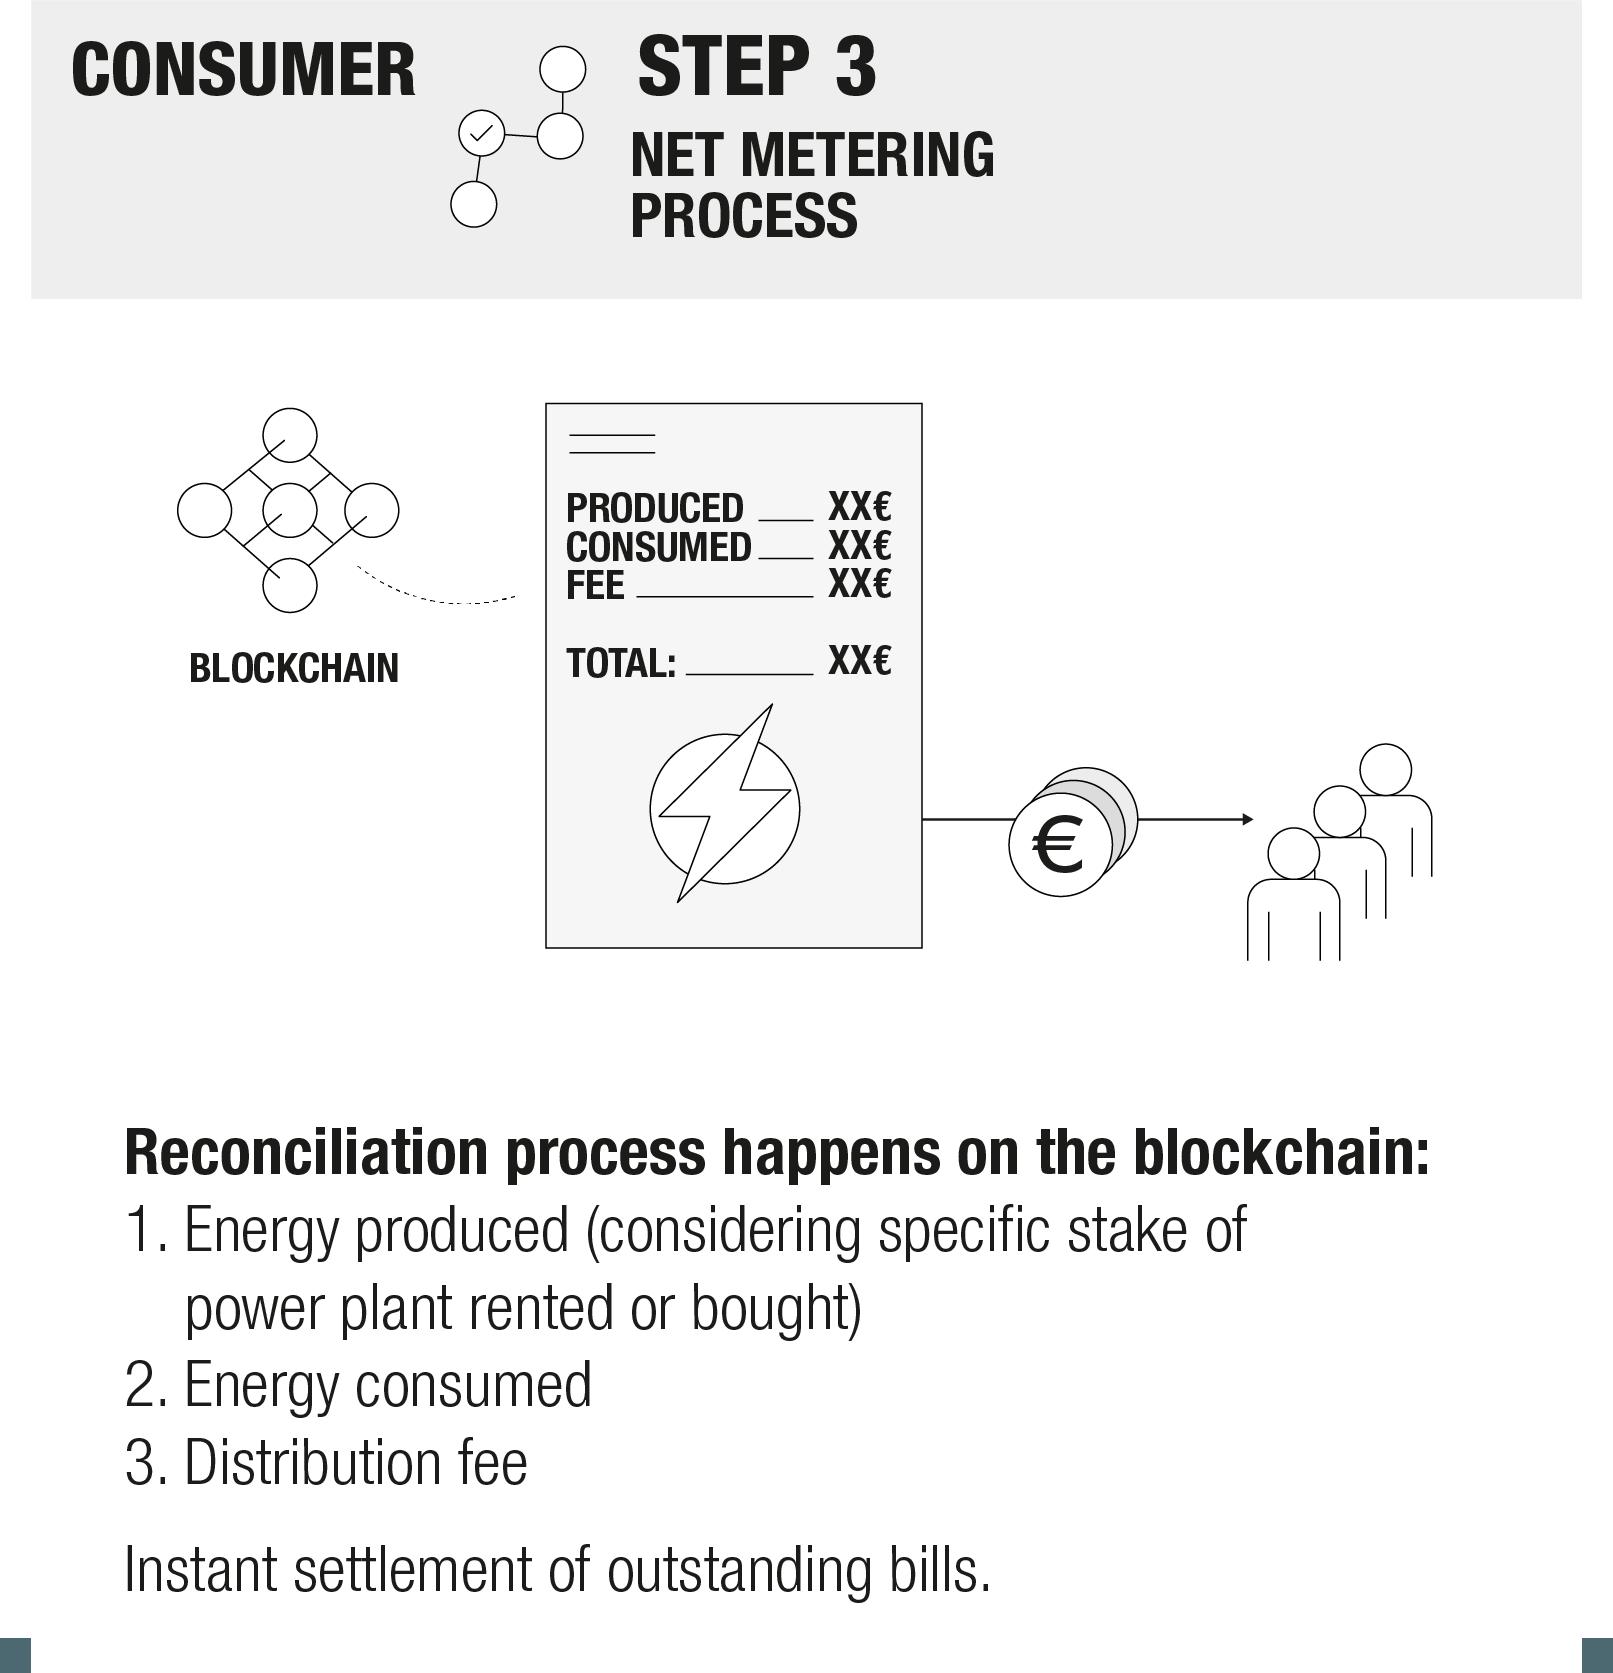 Consumer_Net_Meter_Process.png